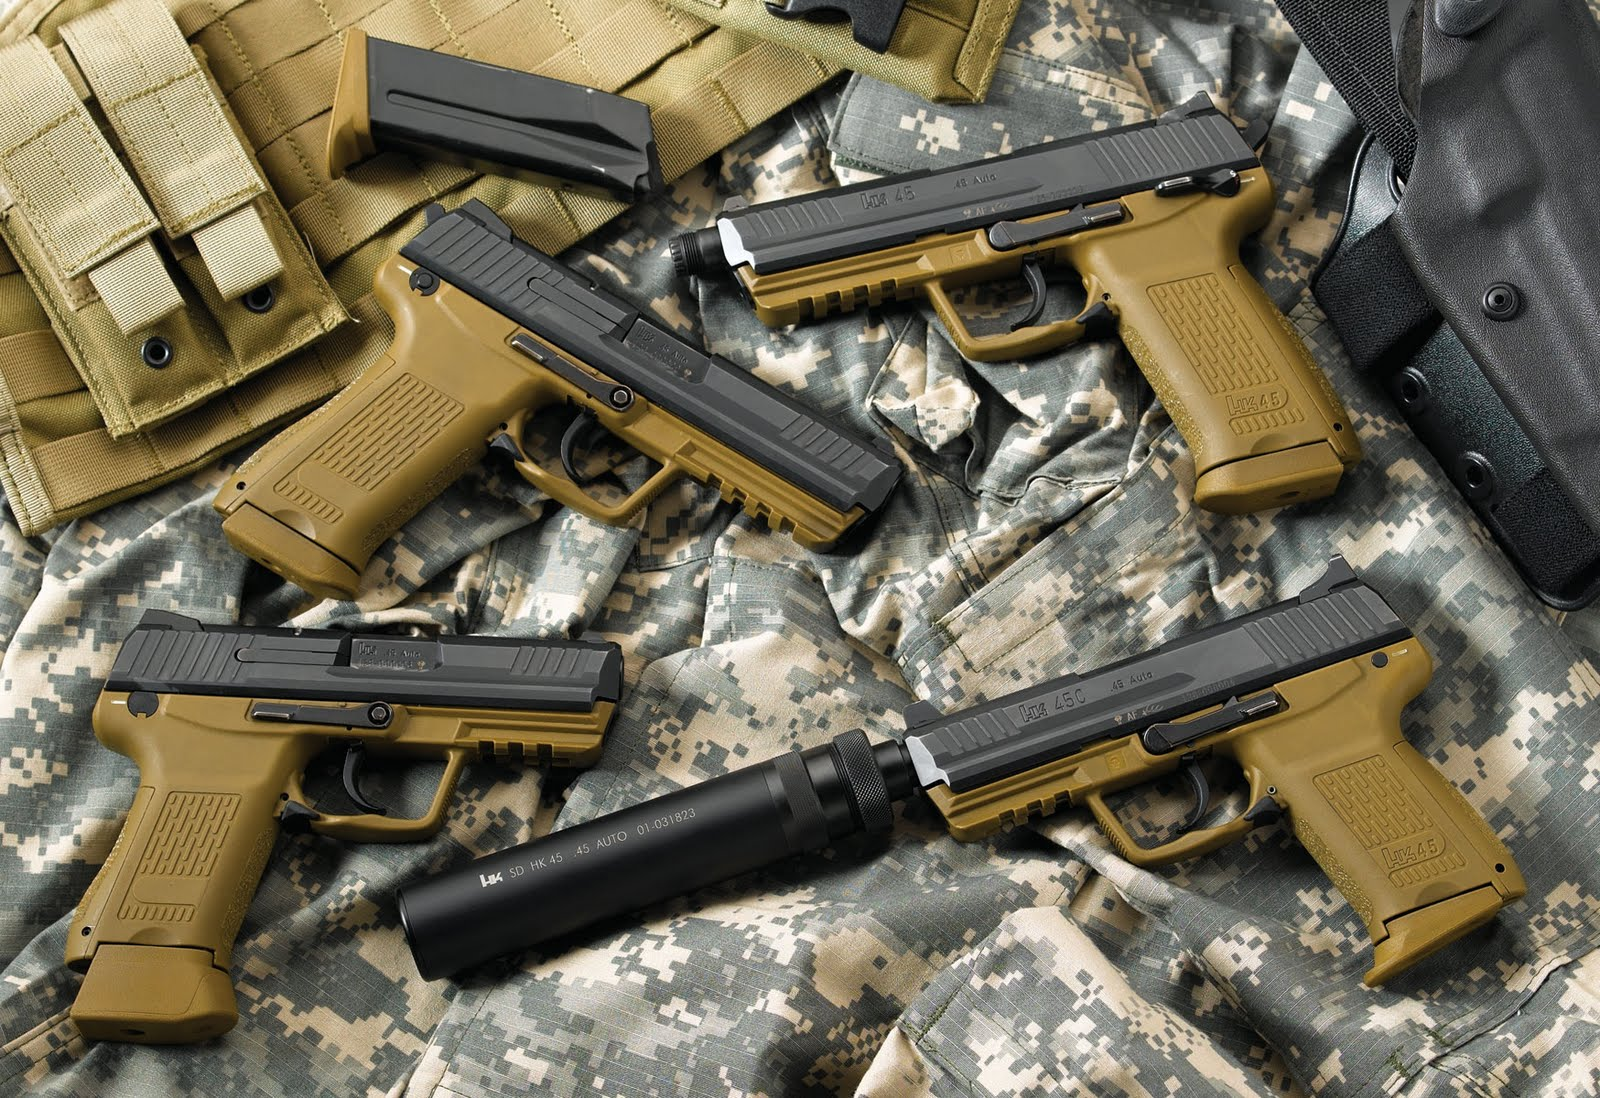 camo hd wallpapers epic desktop sniper ghillie camo suit camouflage hd 1600x1098